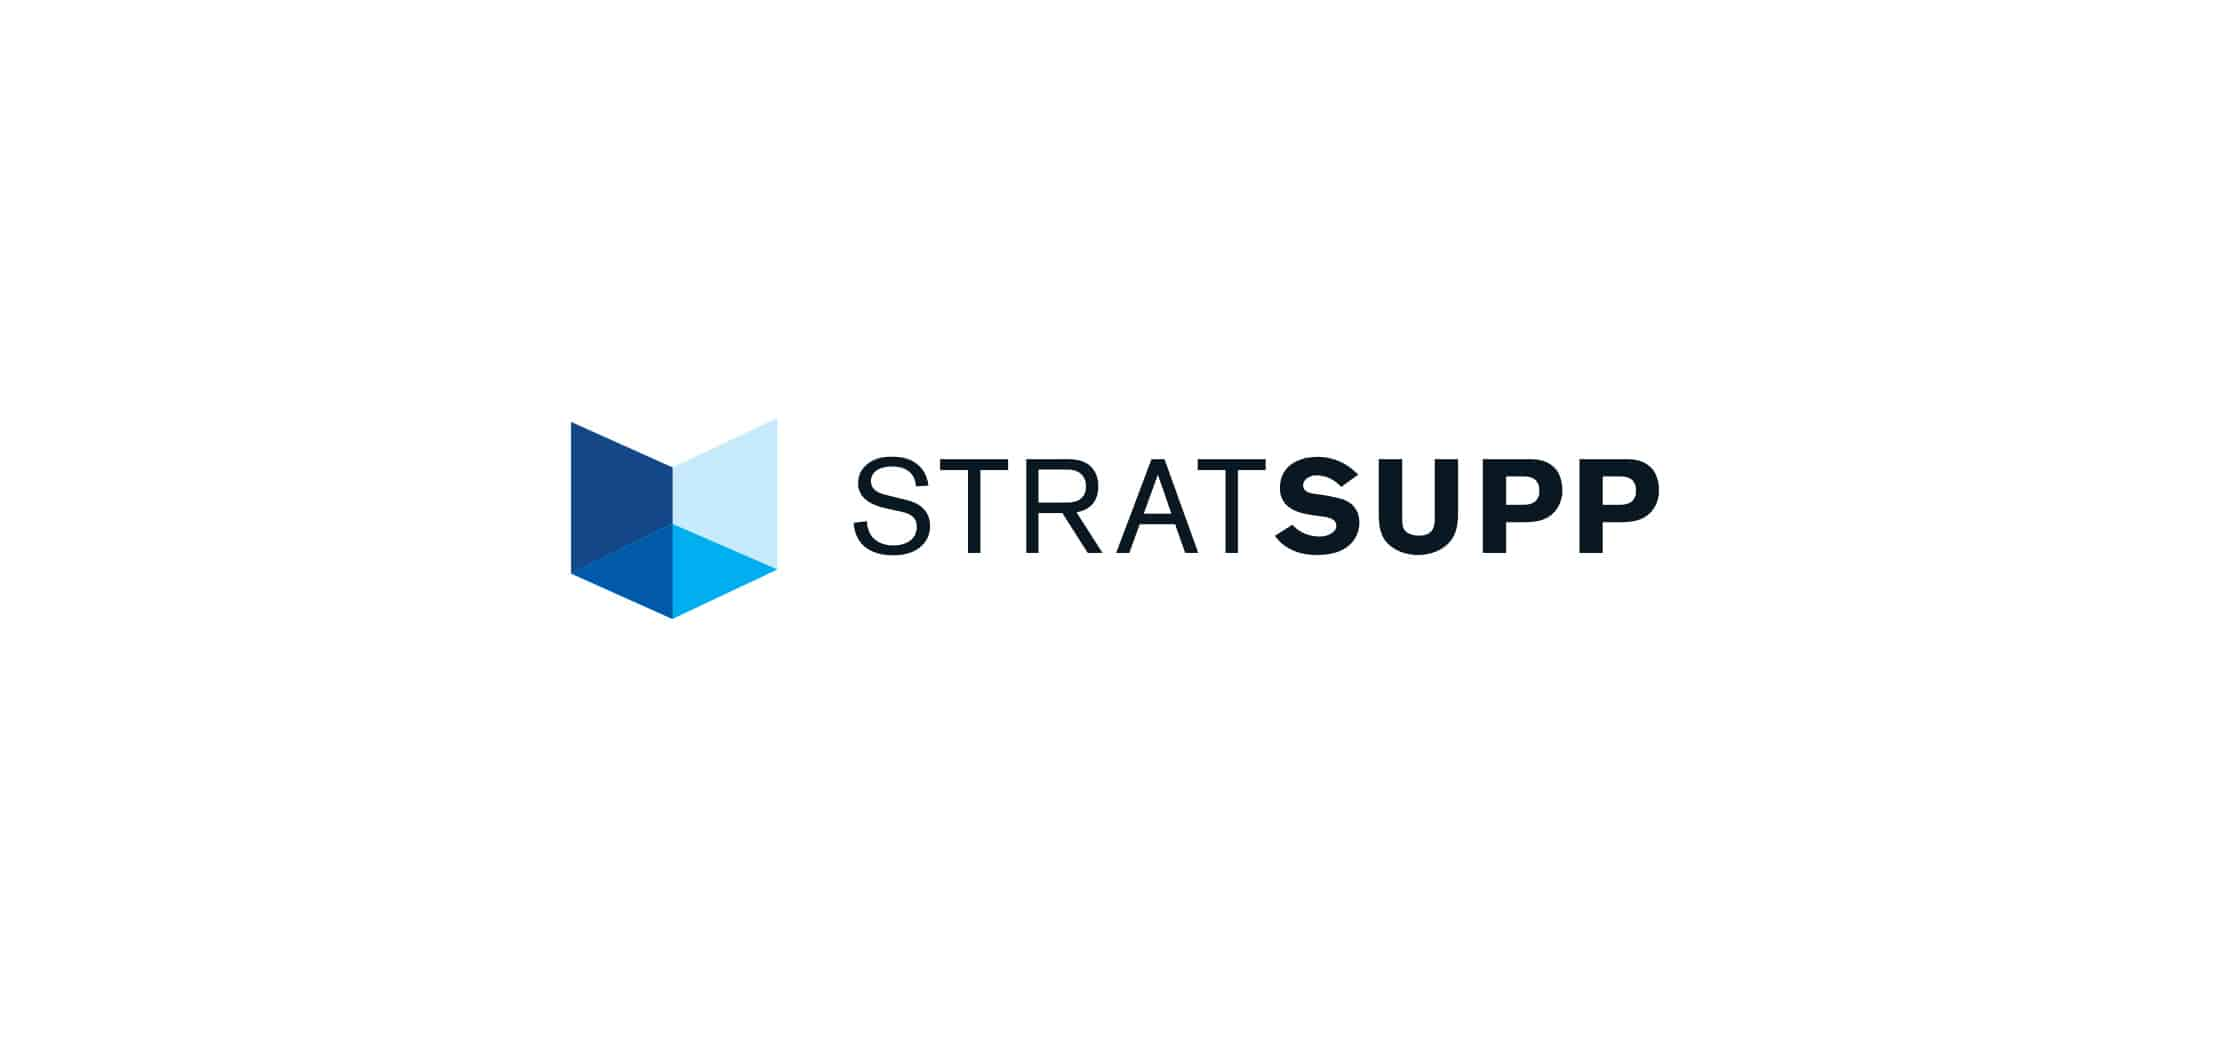 Stratsupp | Mekanic